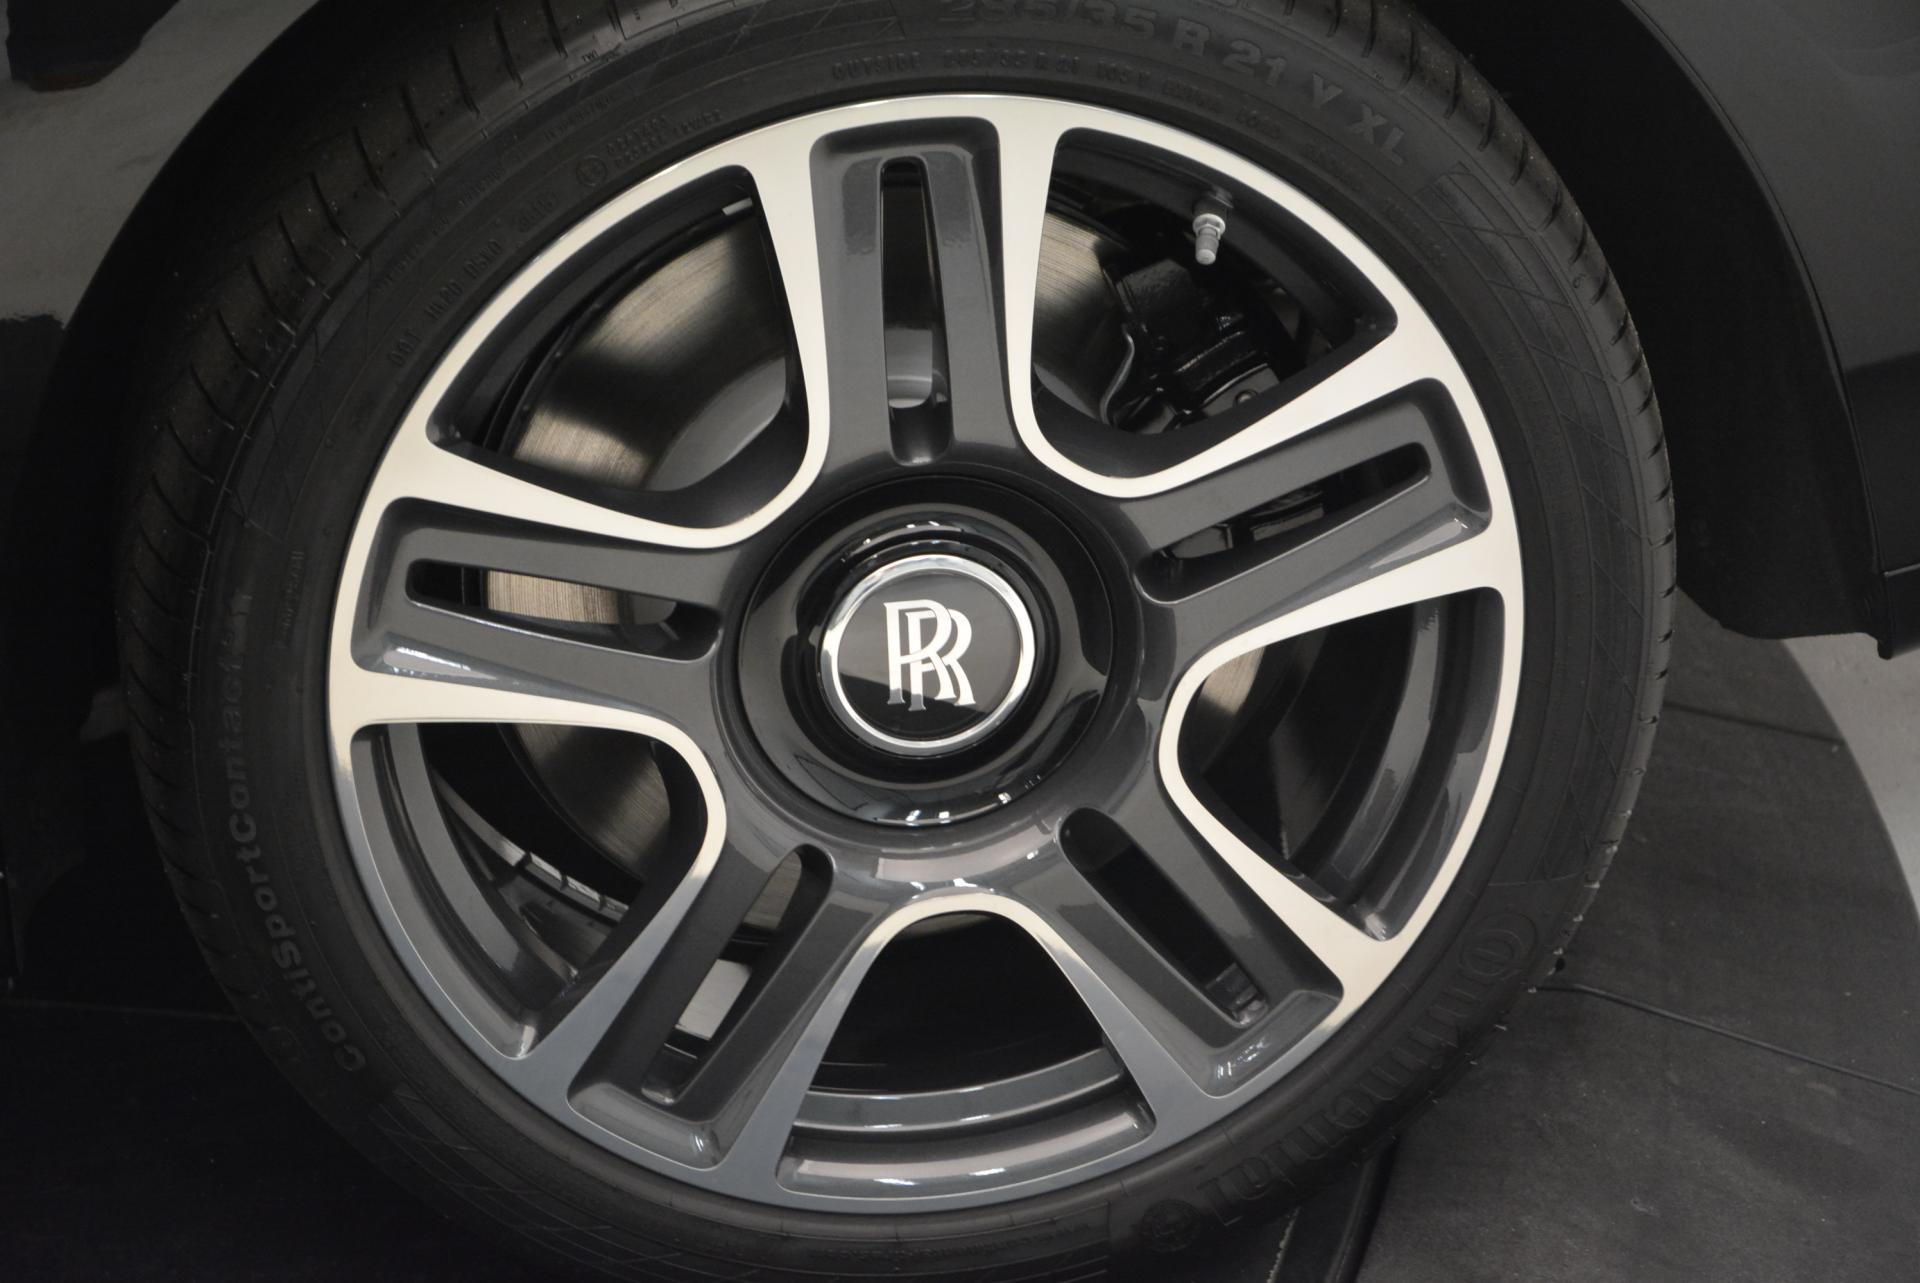 New 2016 Rolls Royce Ghost Series II